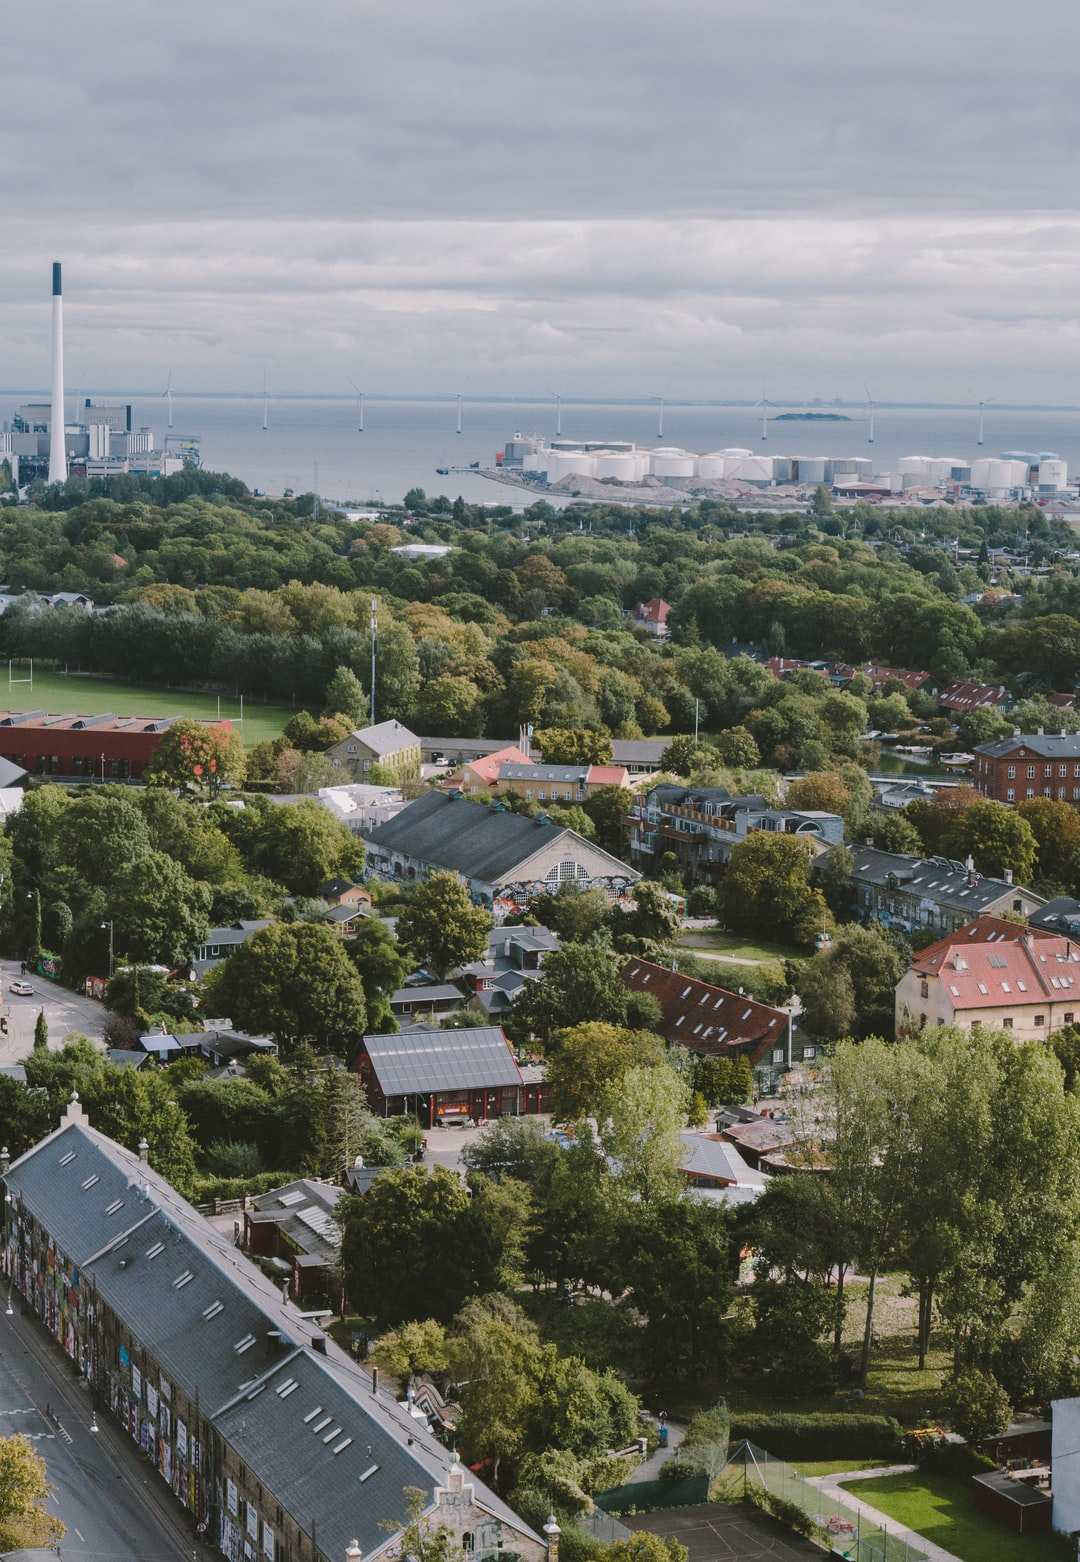 Aerial view on Christiania, the autonomous hippie community